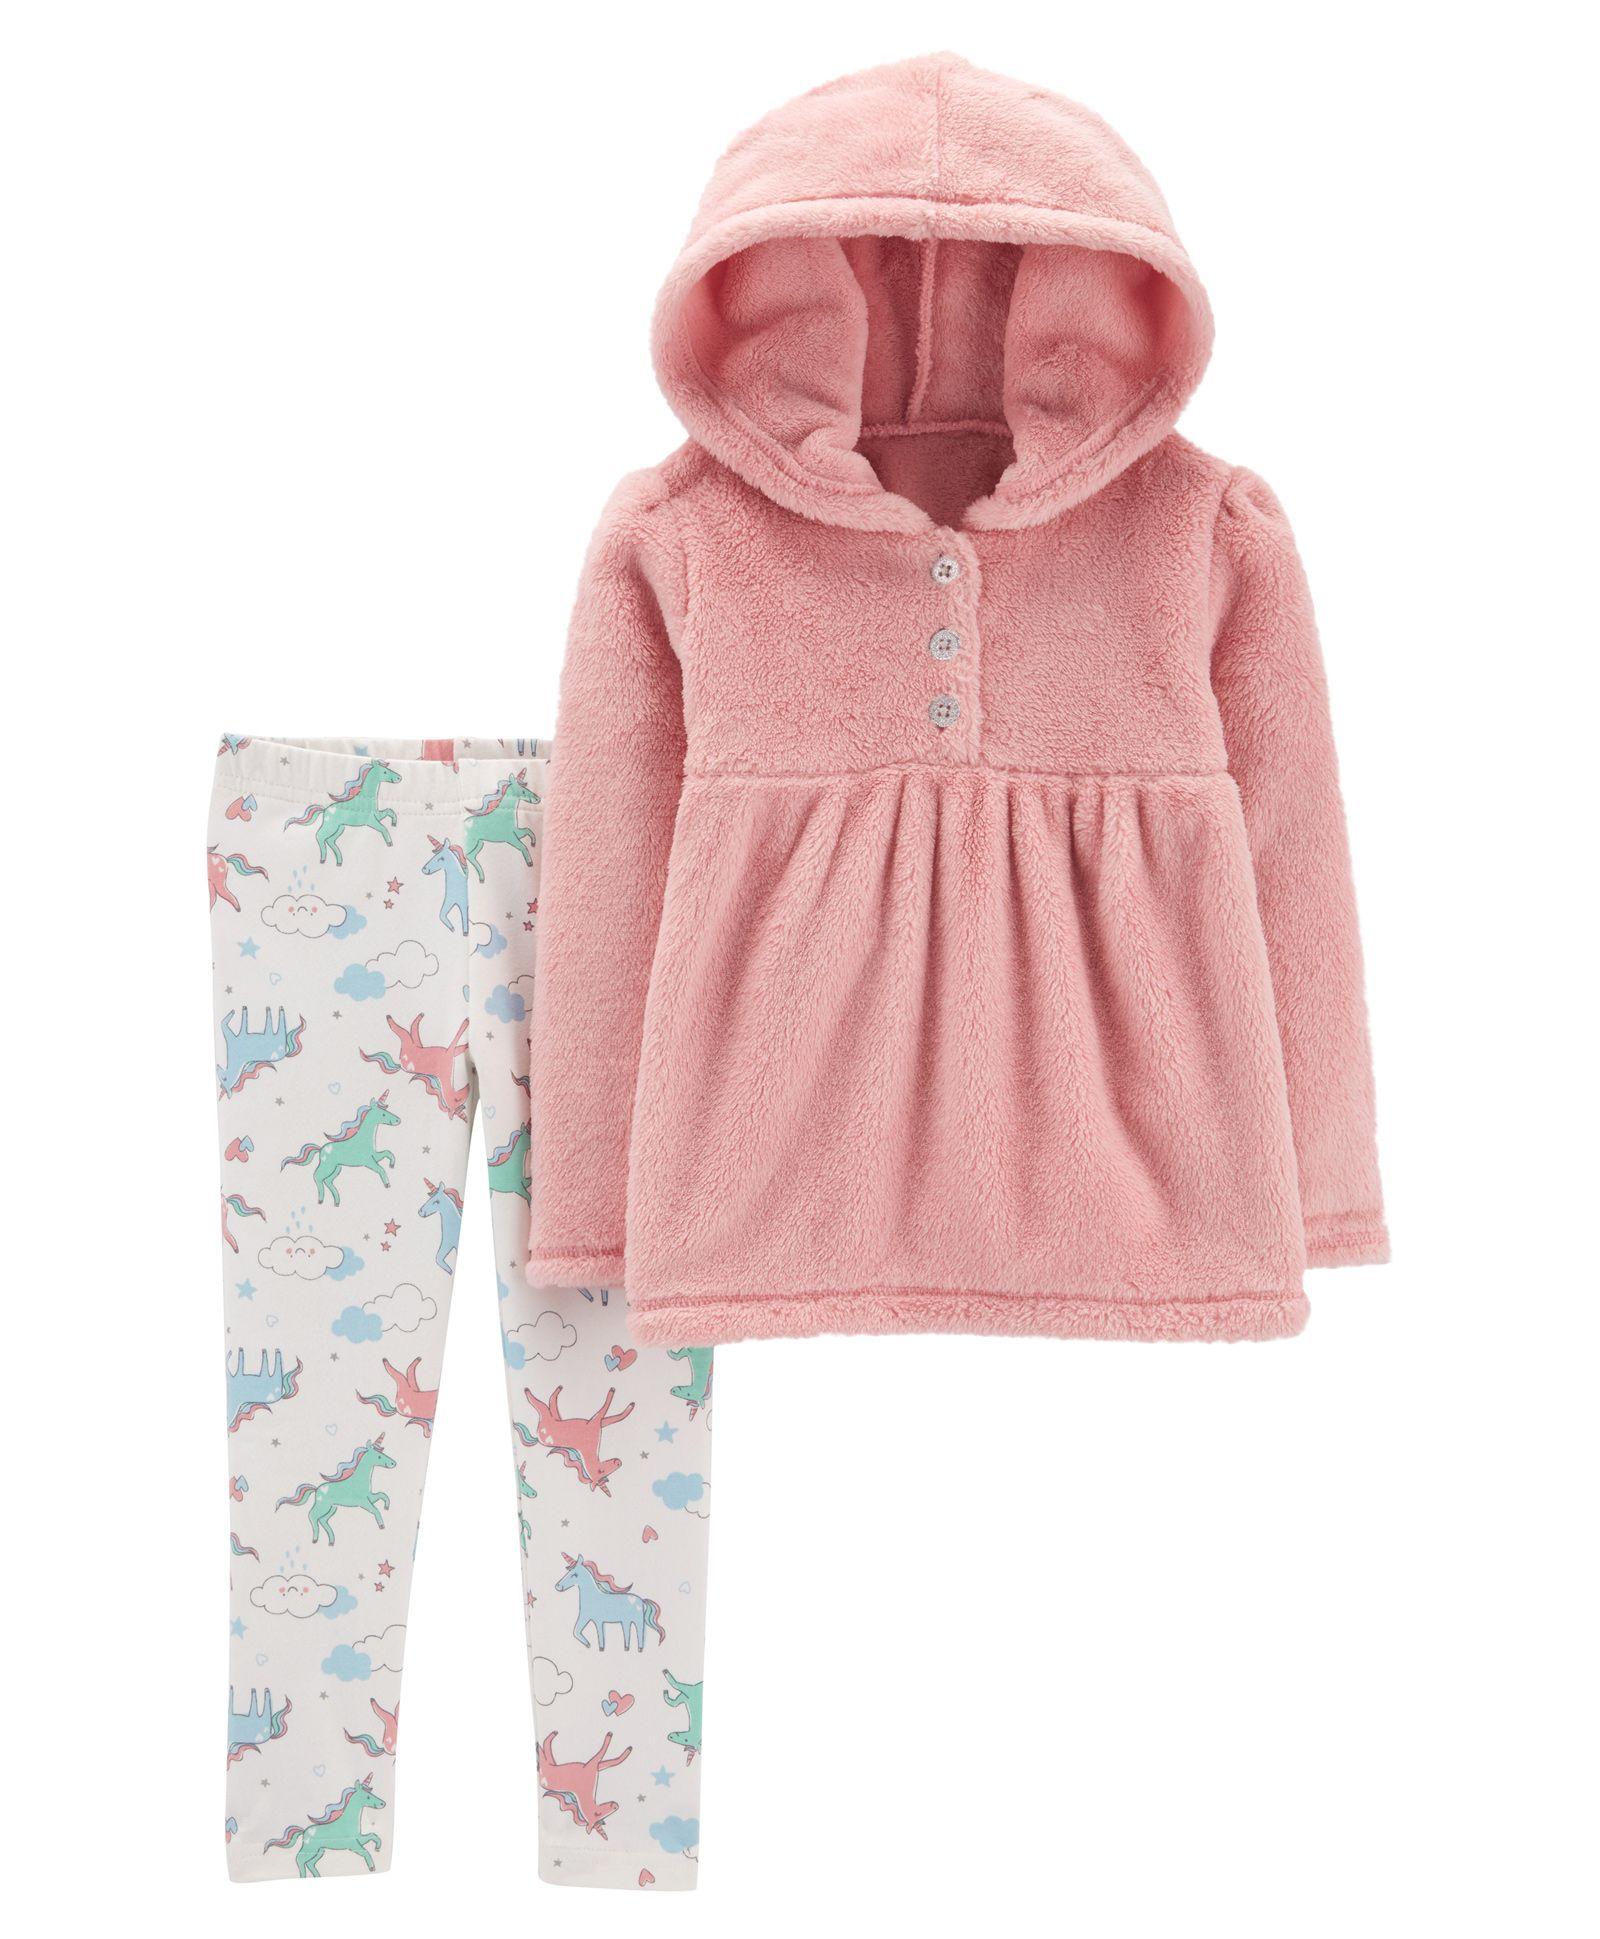 59bf3ad4a Carter s2-Piece Fuzzy Hoodie   Unicorn Legging Set - Pink White